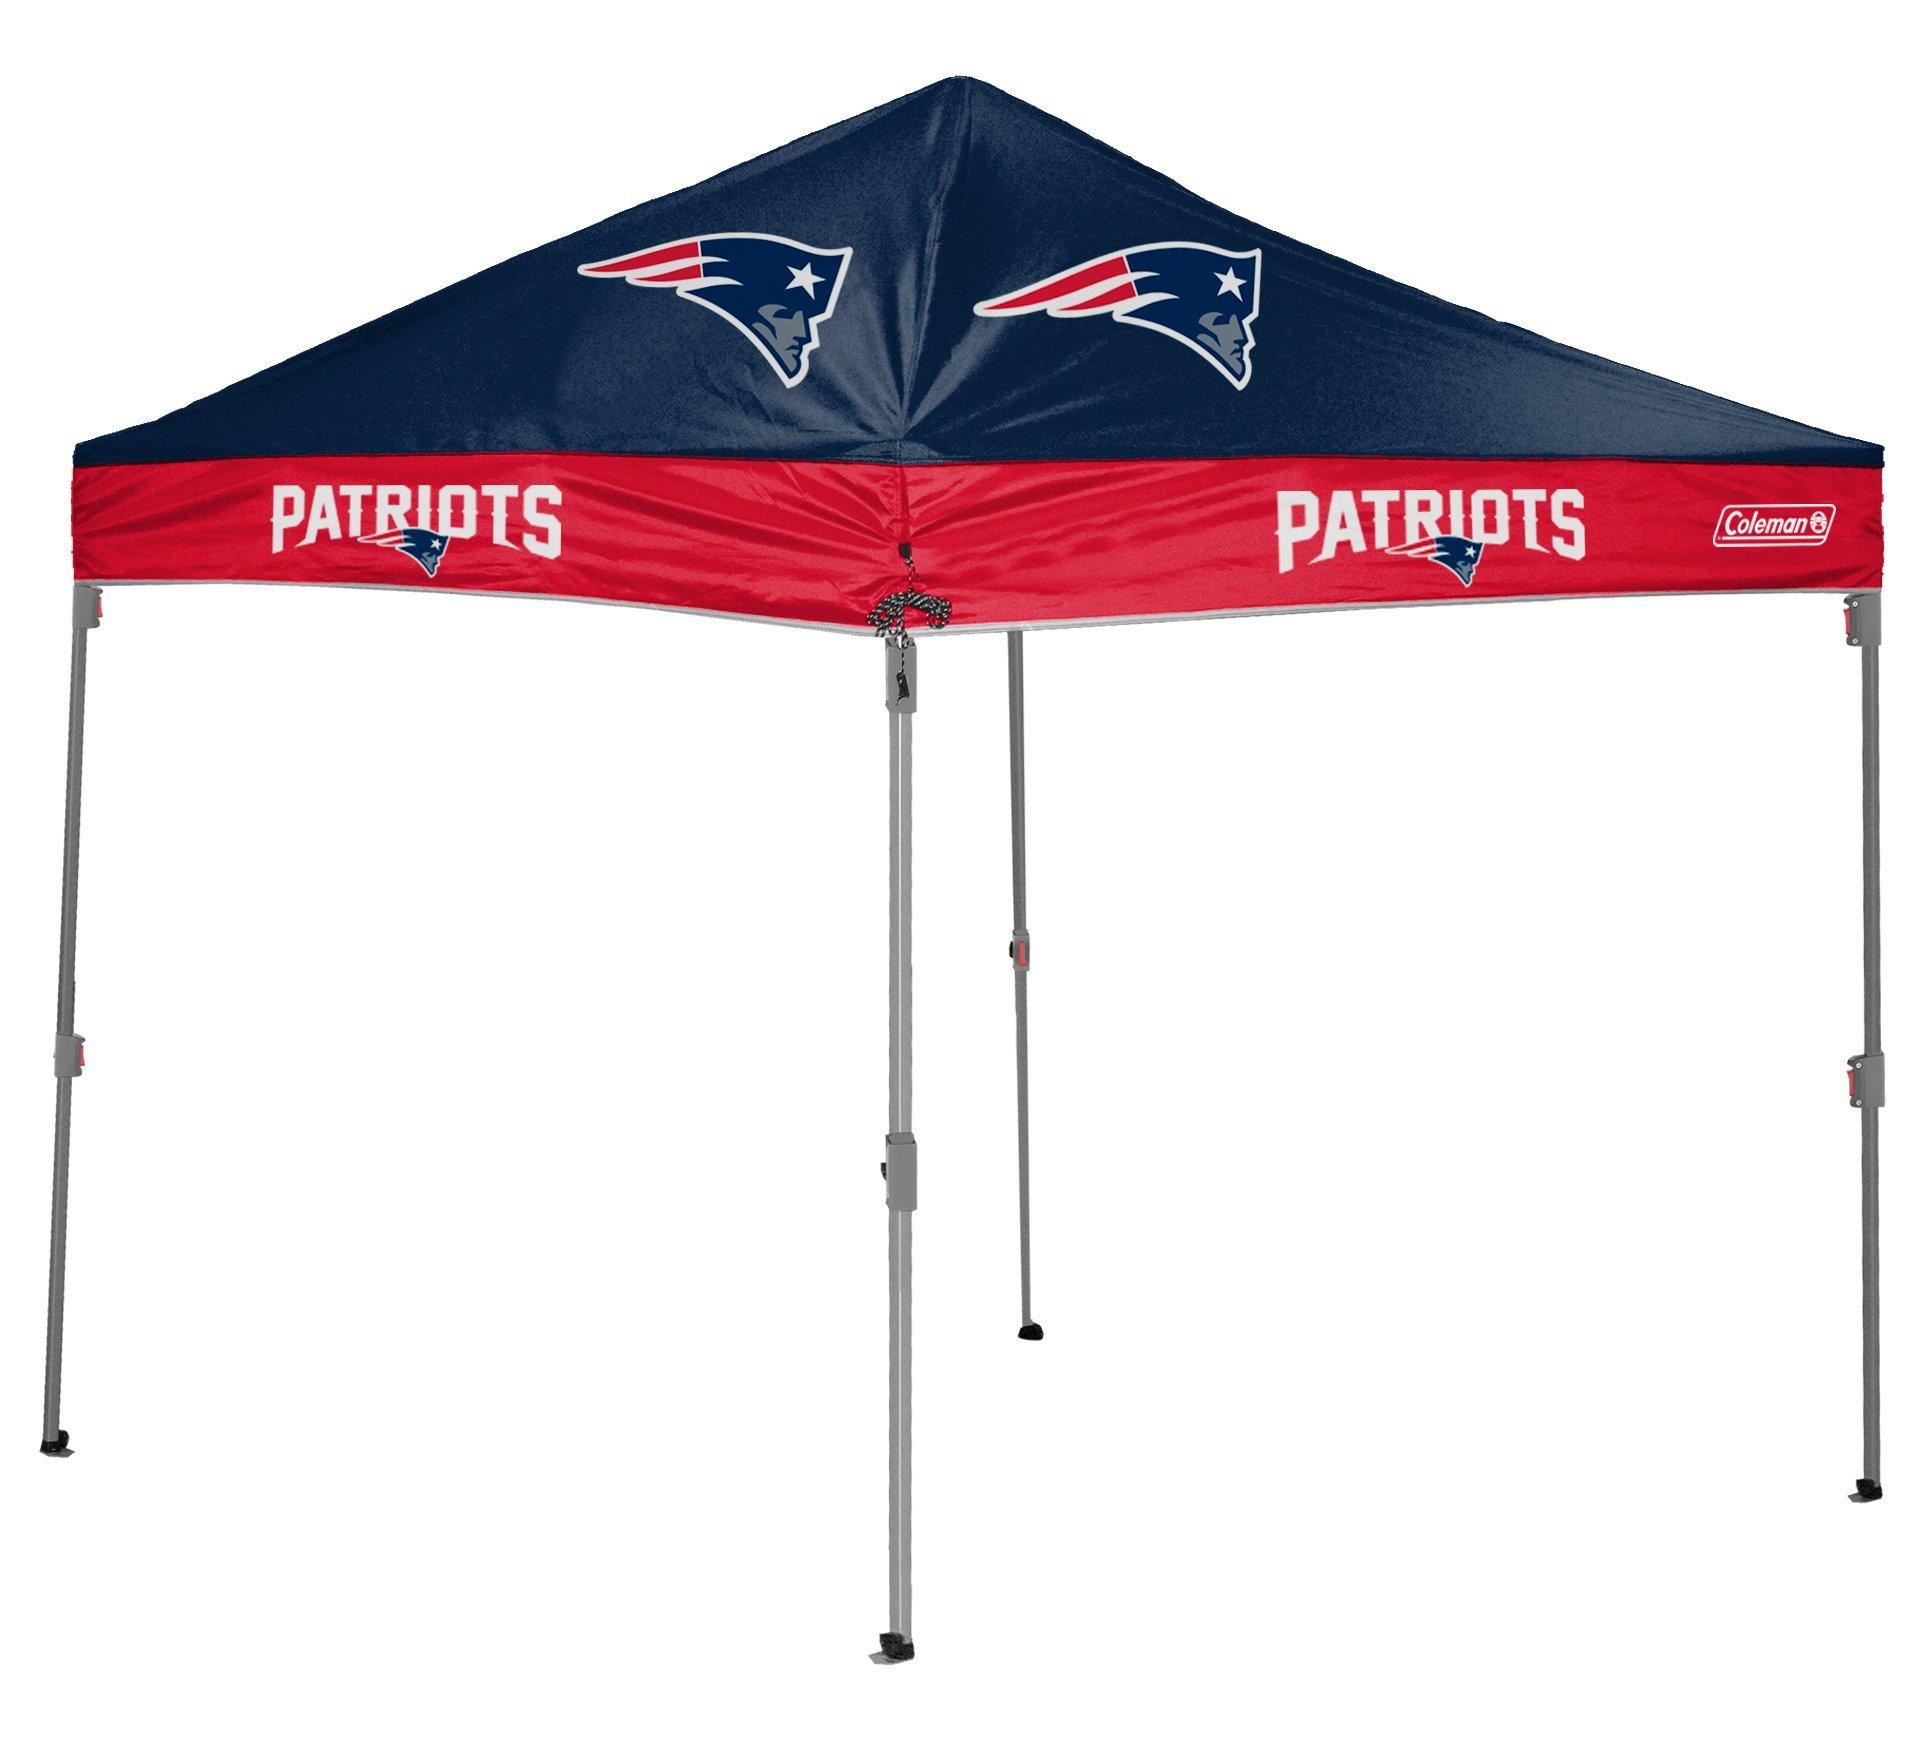 NFL 10' x 10' Canopy, NE Patriots